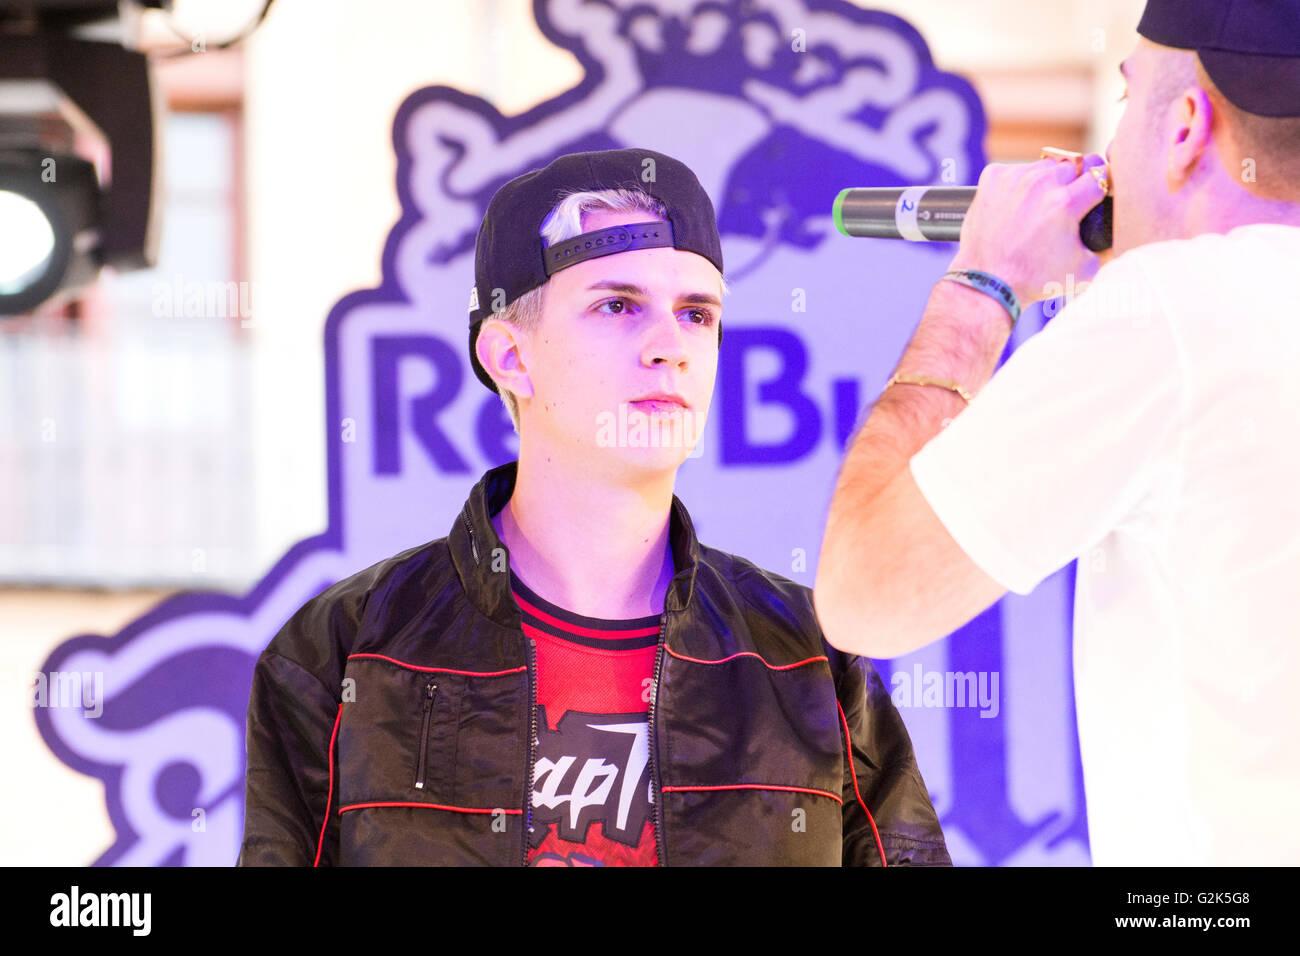 Spanish MC 'Lopes' sings at freestyle battle 'RedBull Batalla de Los Gallos' in Leon (Spain) on - Stock Image